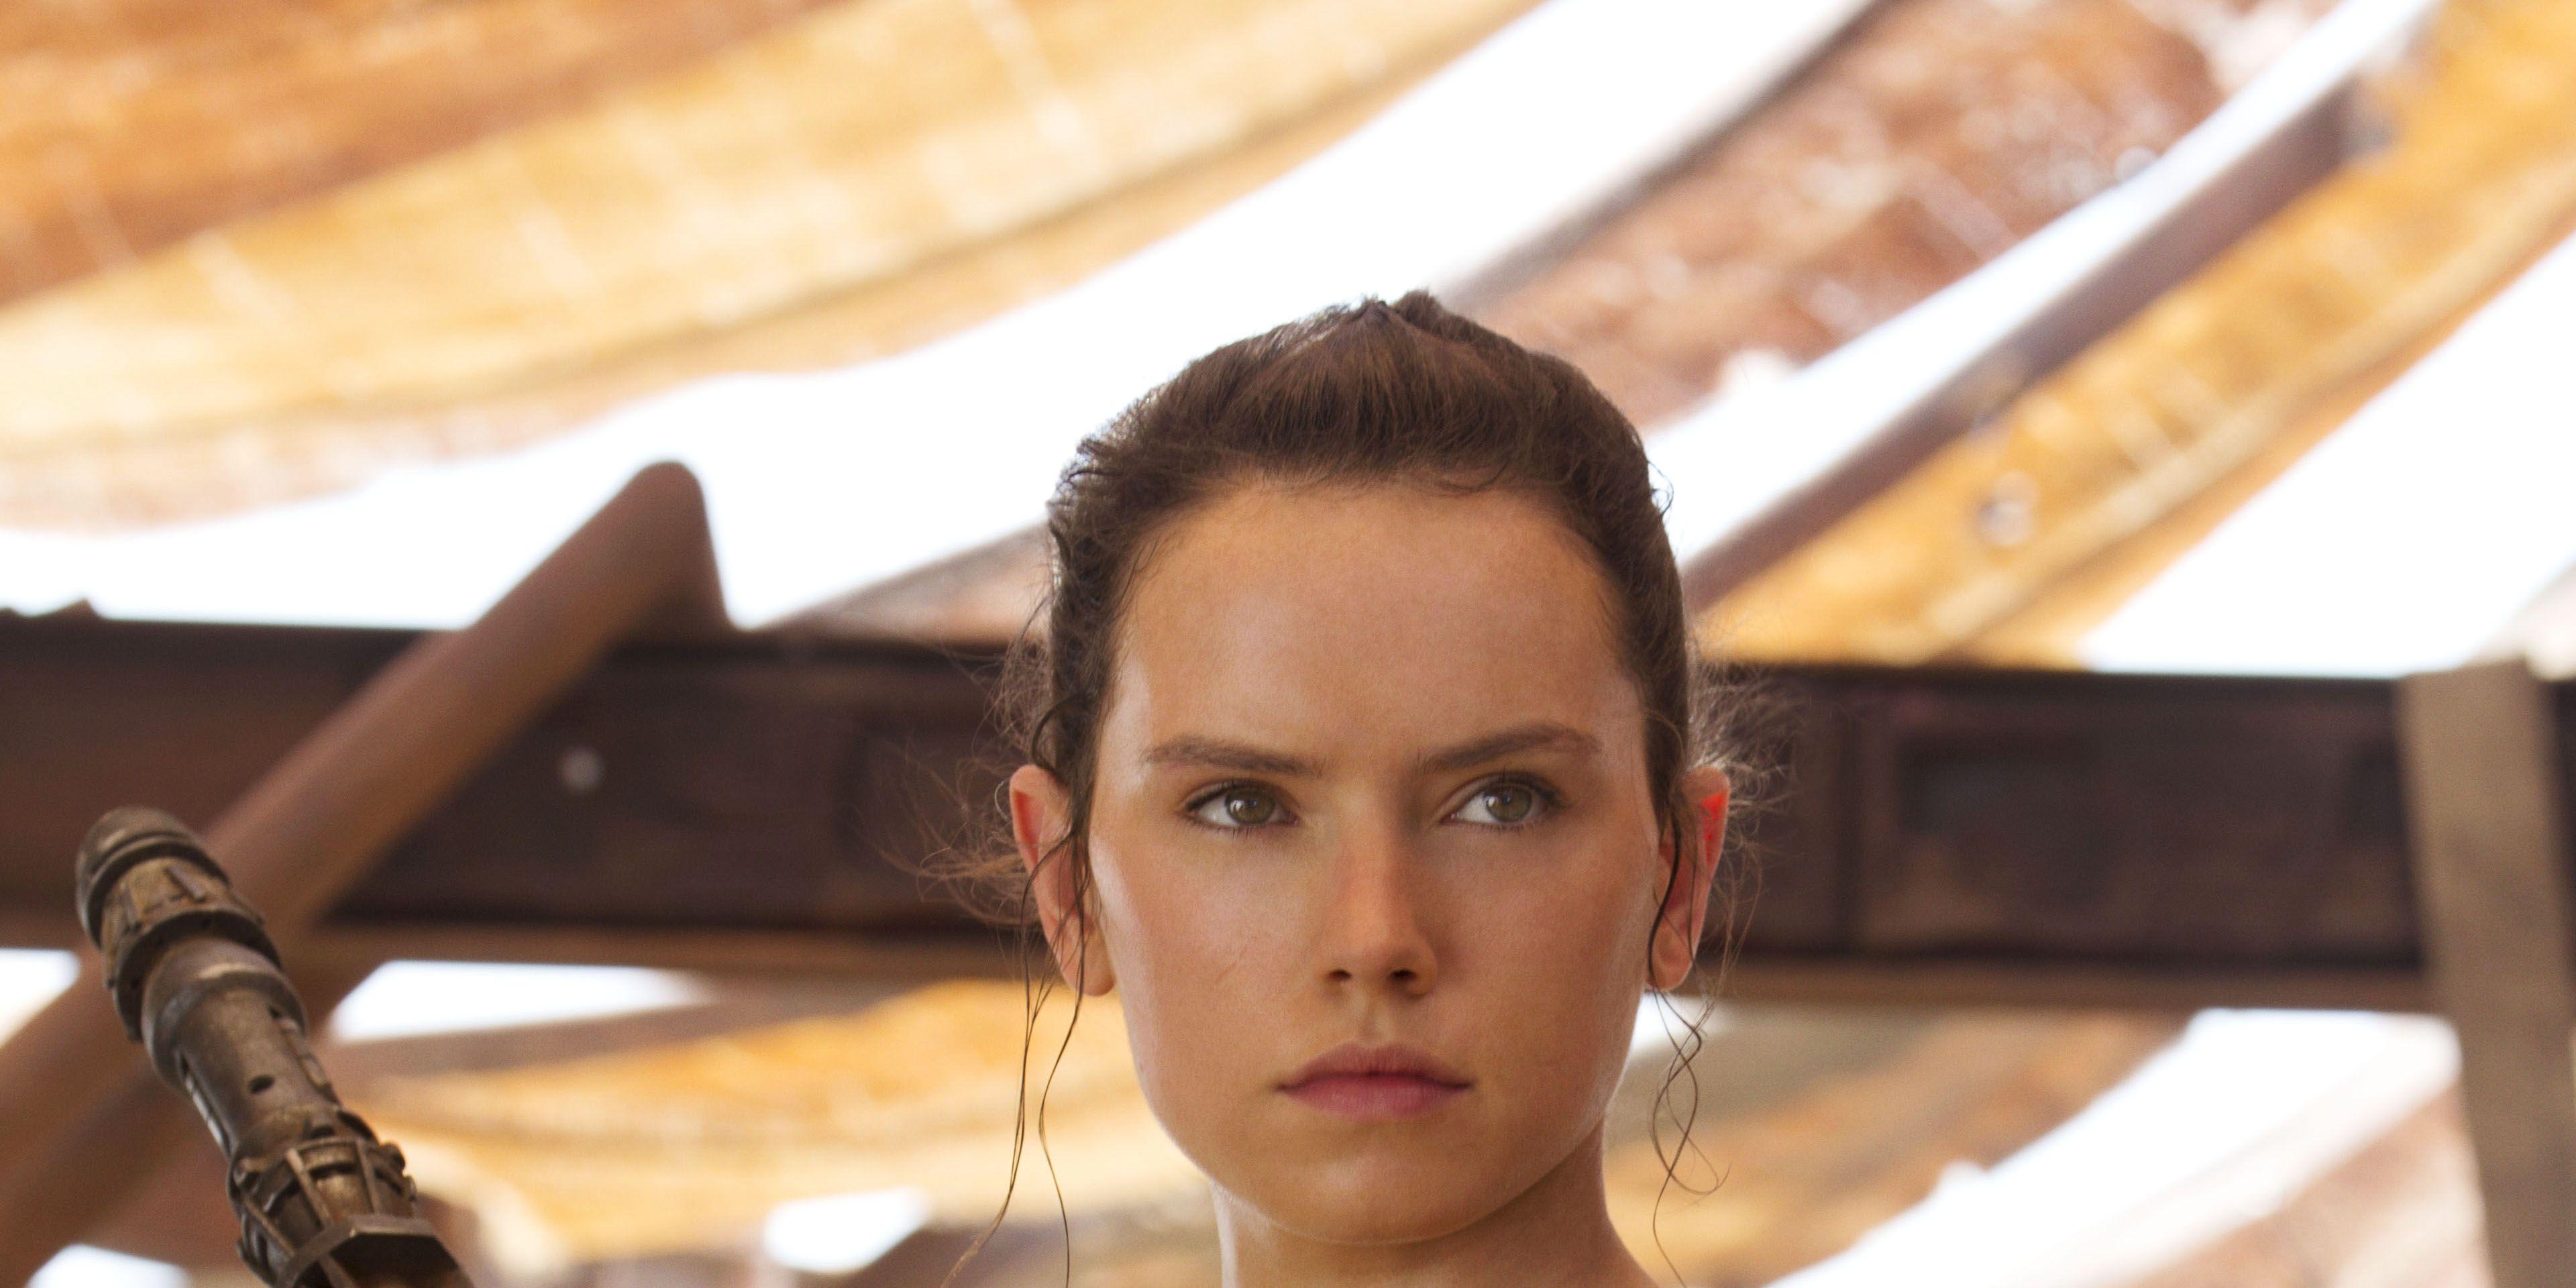 Star Wars - The Force Awakens - 2015